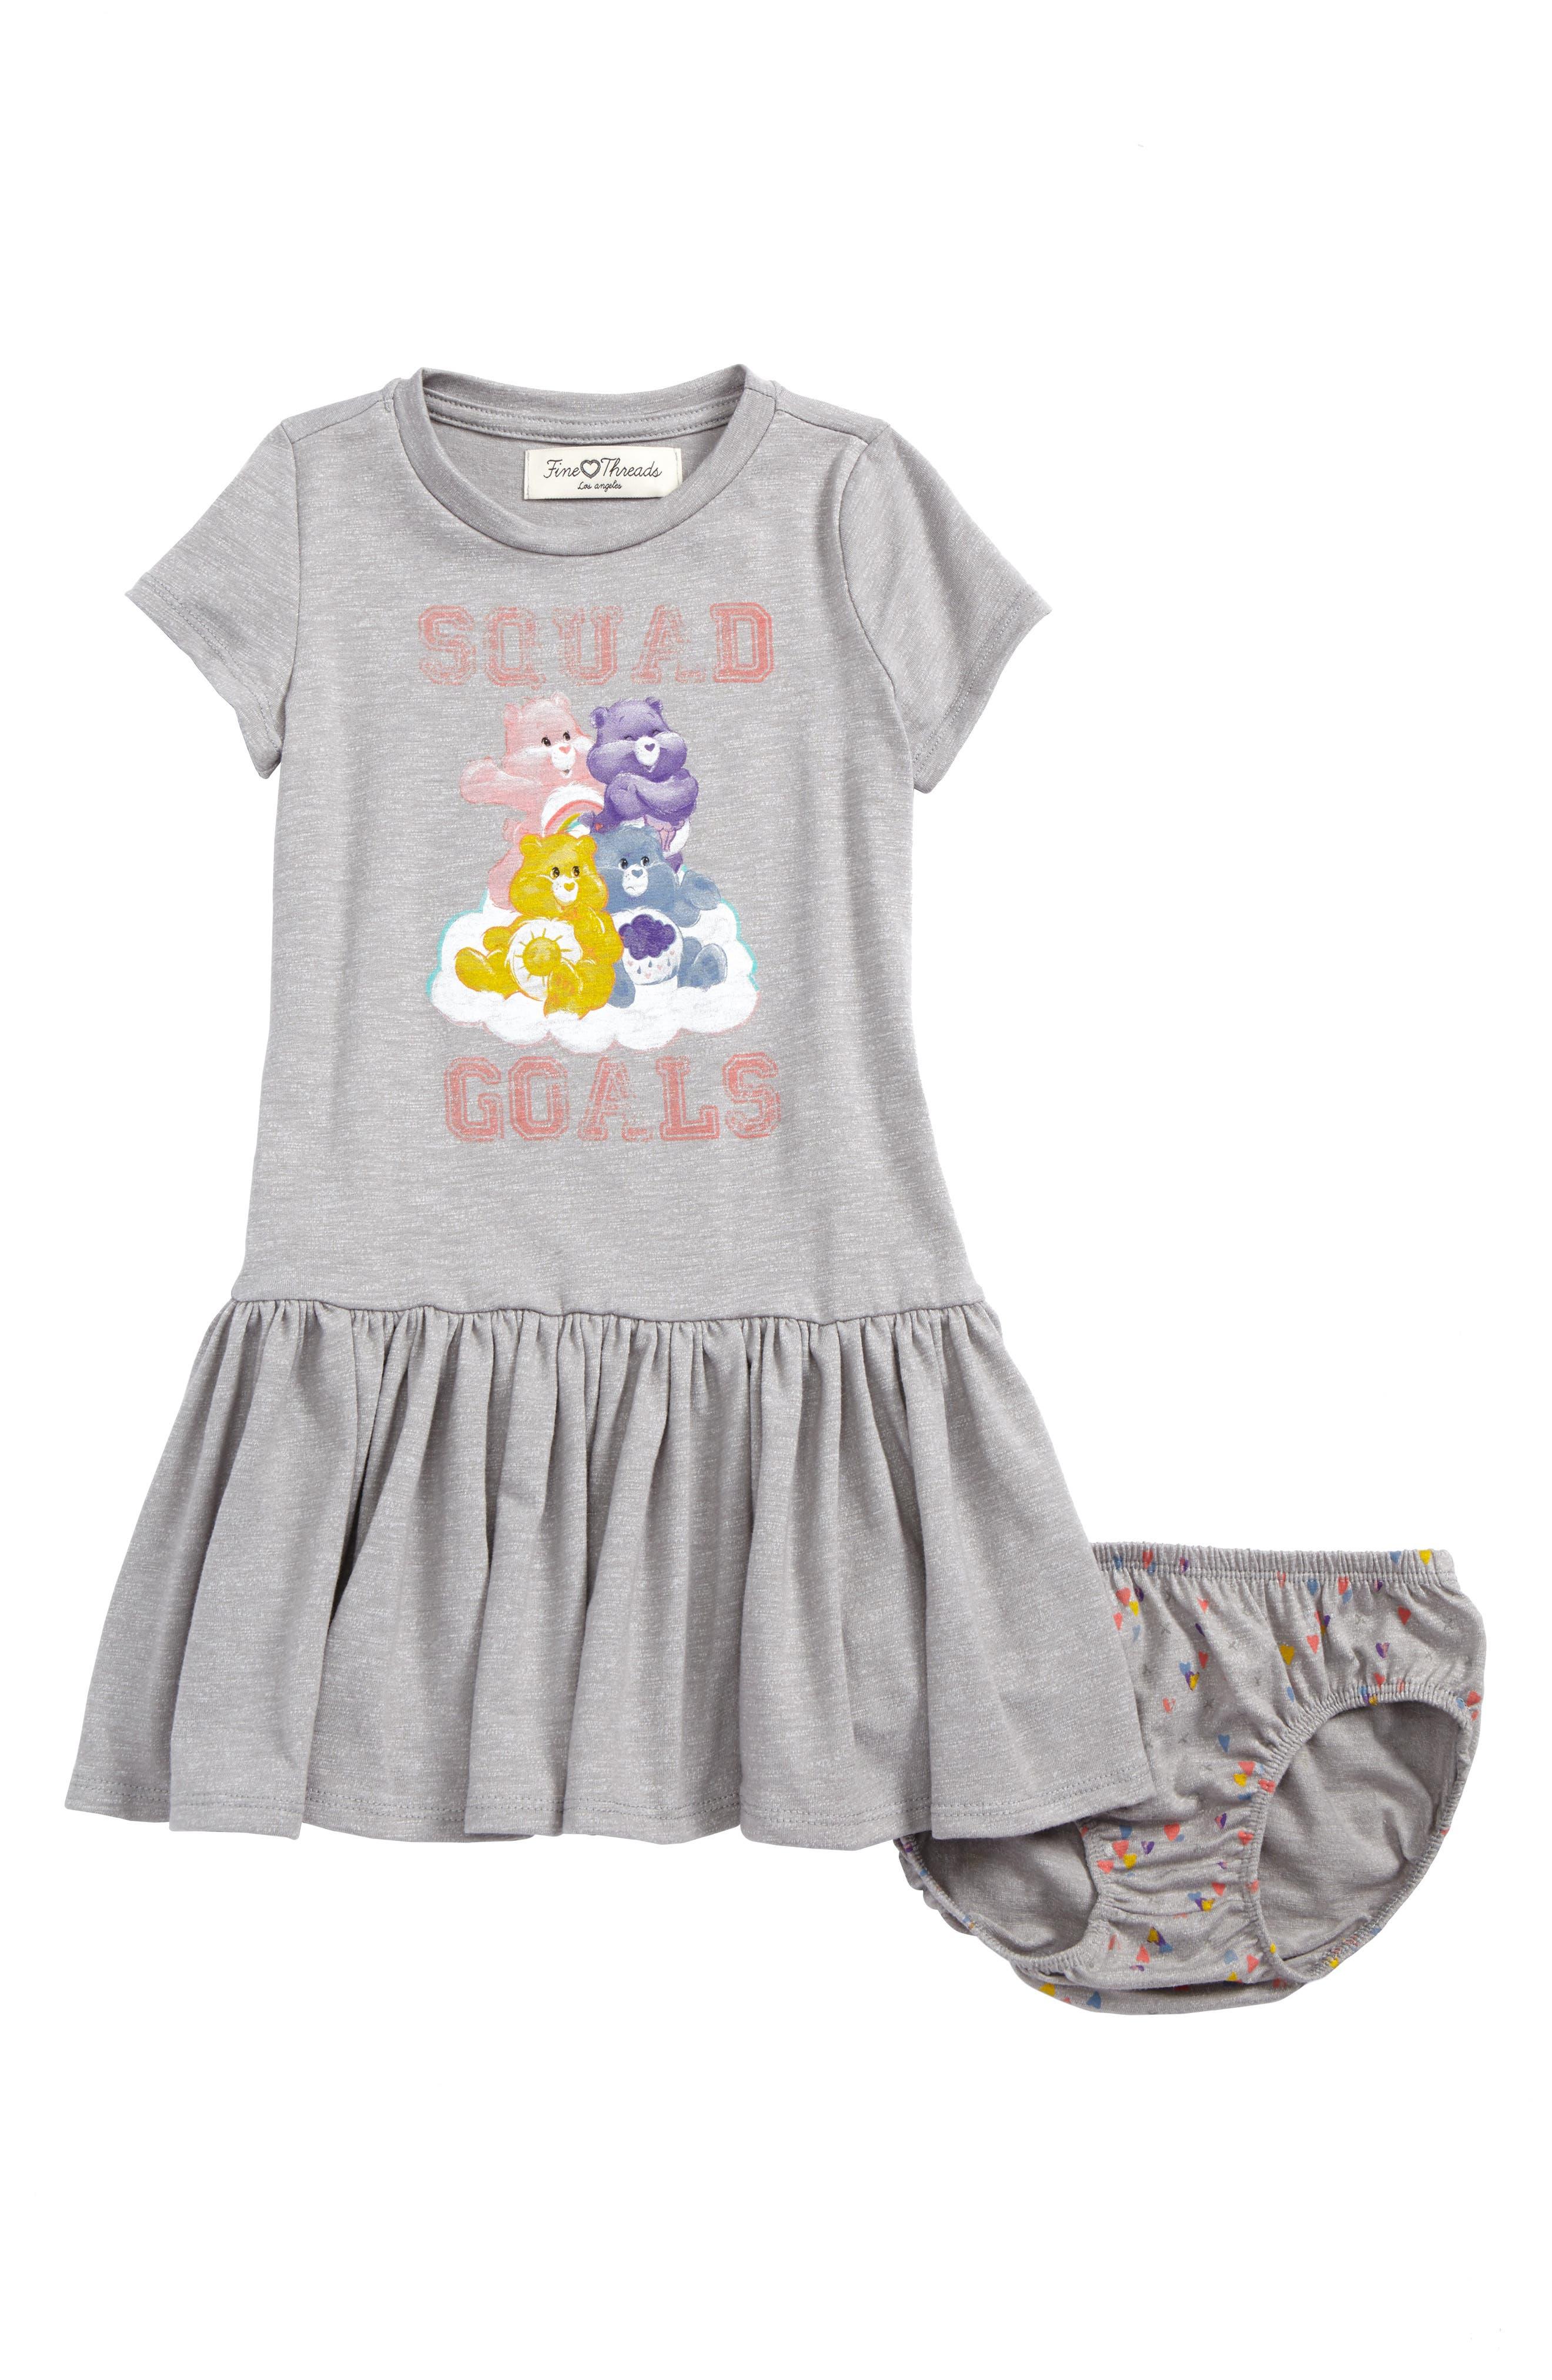 Alternate Image 1 Selected - Care Bears™ by Fine Threads Squad Goals Dress (Toddler Girls & Little Girls)